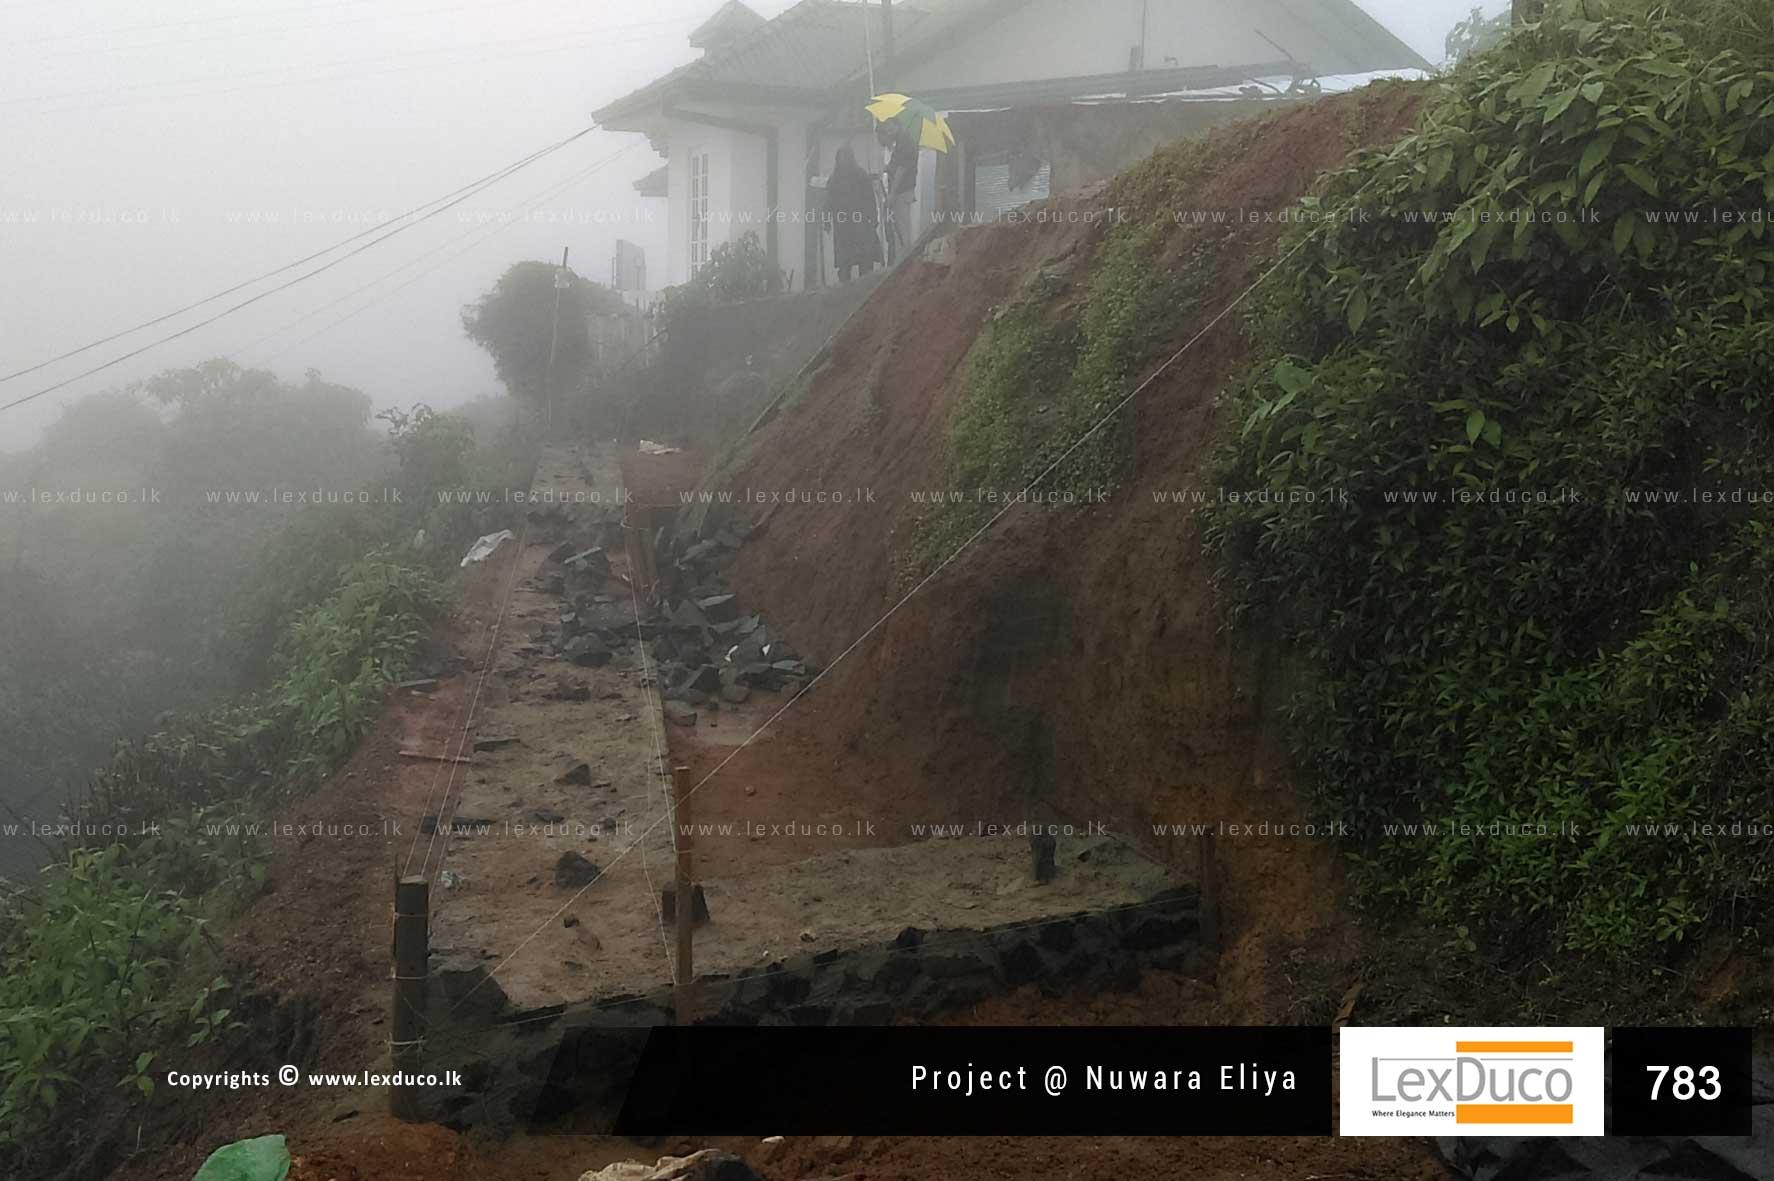 Residential Housing Project at Nuwara Eliya | Lex Duco